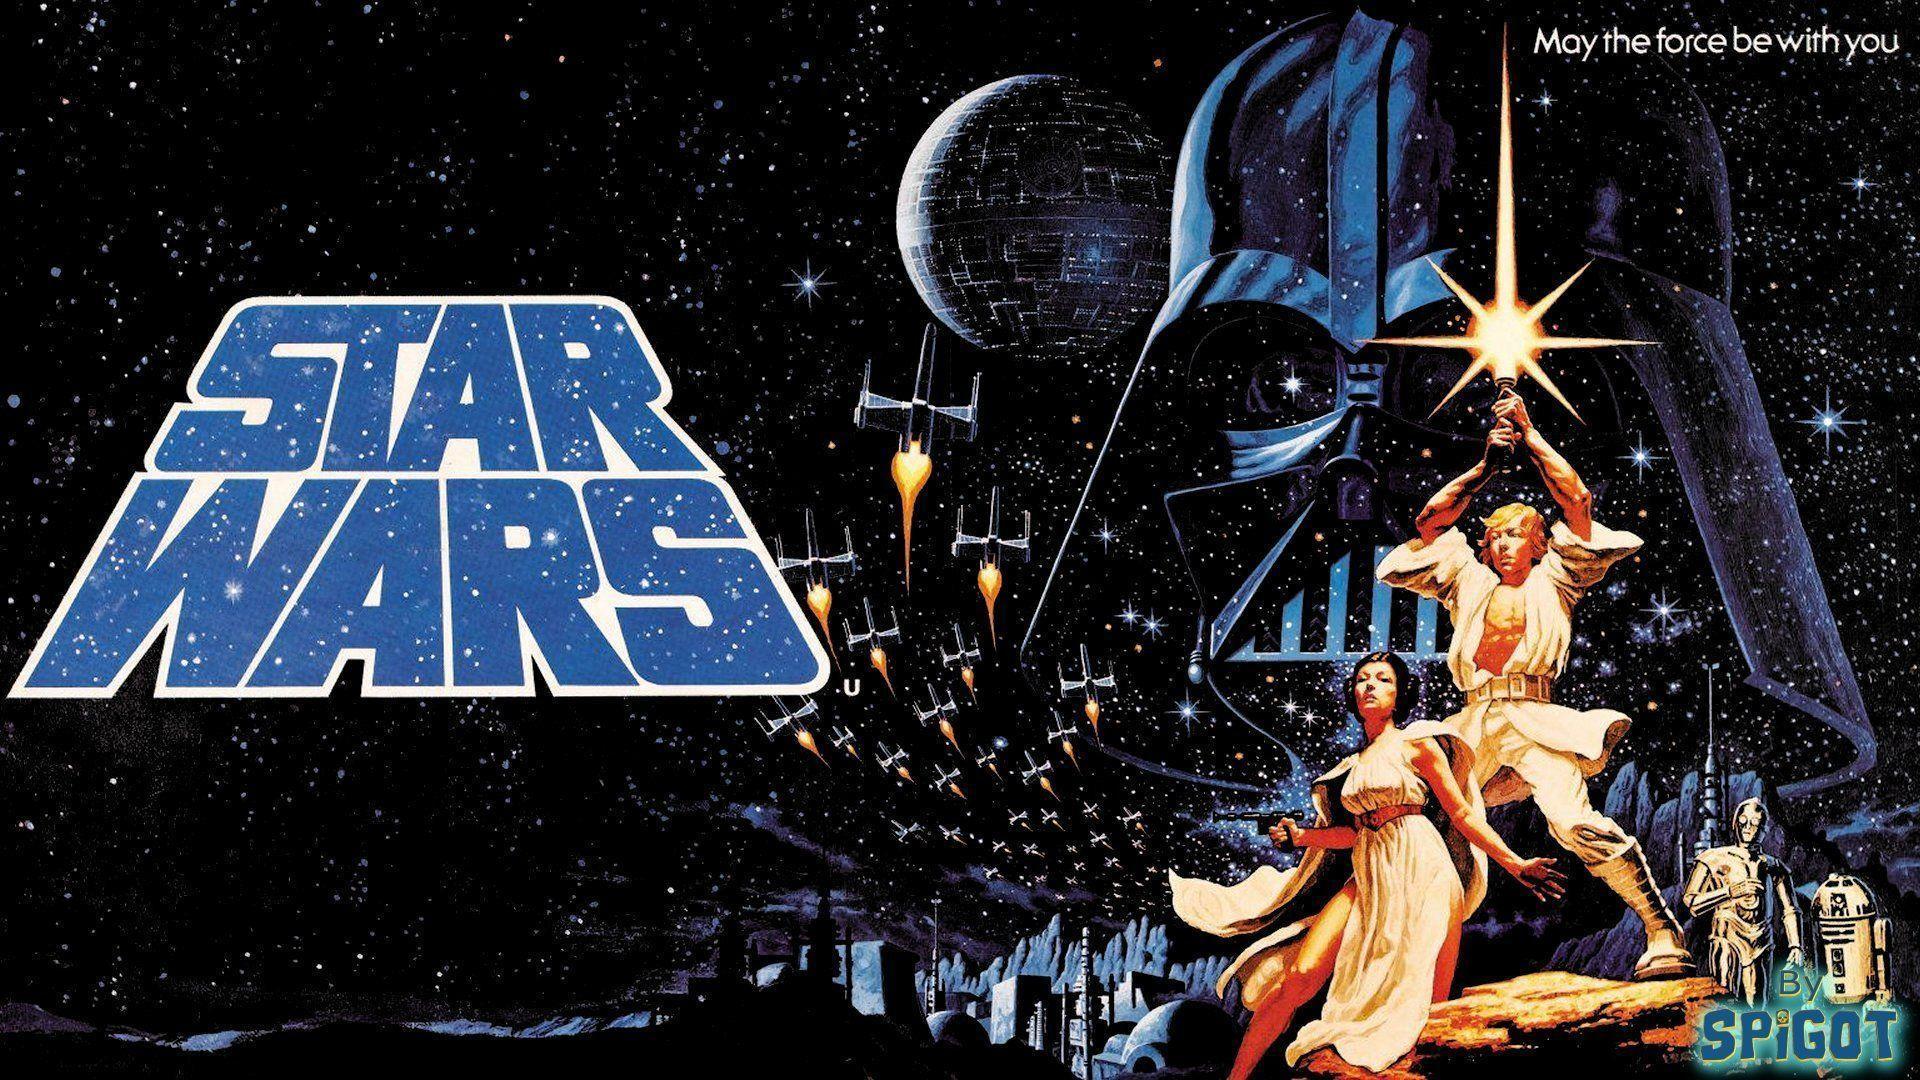 Star Wars Wallpapers 1920x1080 - Wallpaper Cave